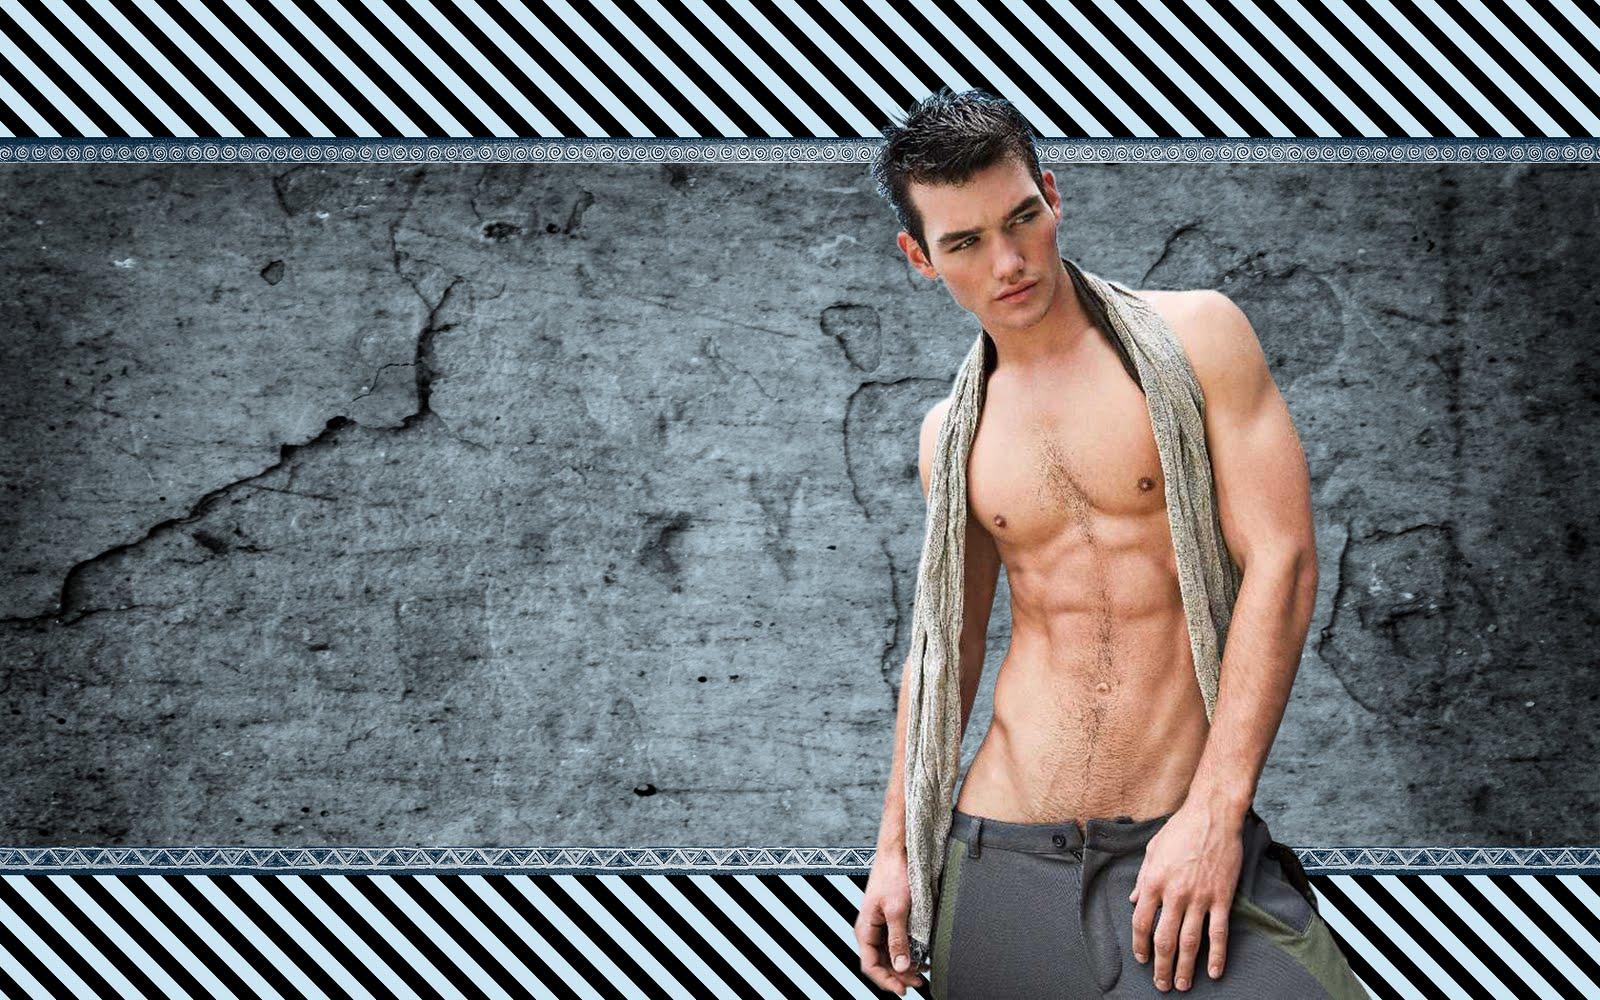 http://4.bp.blogspot.com/-34VpJIyGlD0/TWFXTKfaXpI/AAAAAAAABZo/whyfcn4Y1NY/s1600/Christopher+Fawcett+2+w.jpg